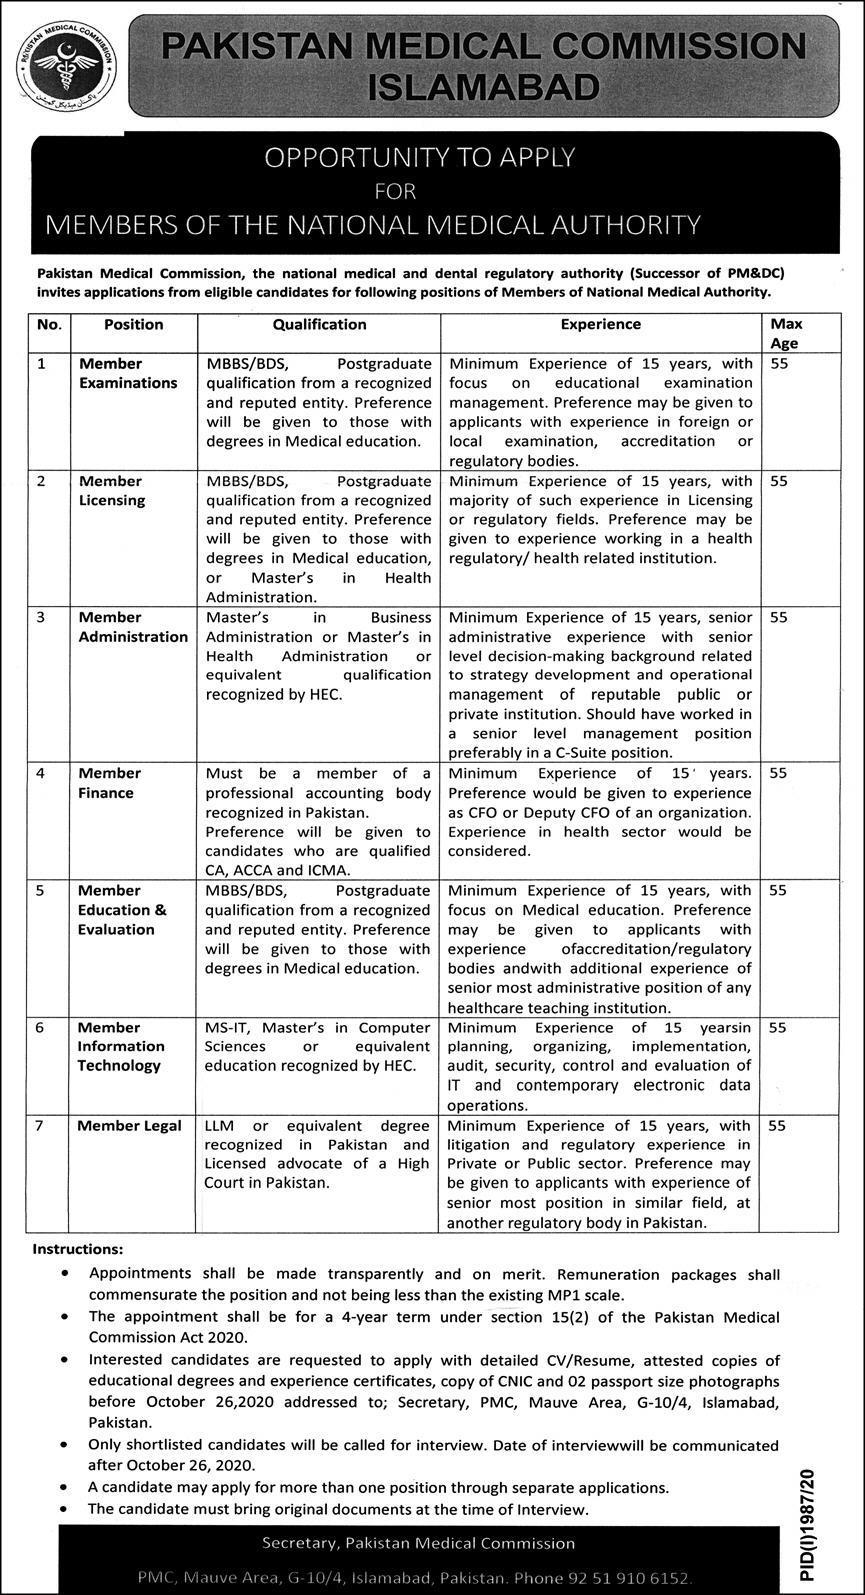 Pakistan Medical Commission PMC Latest Jobs Advertisement in Pakistan Jobs 2020 - 2021